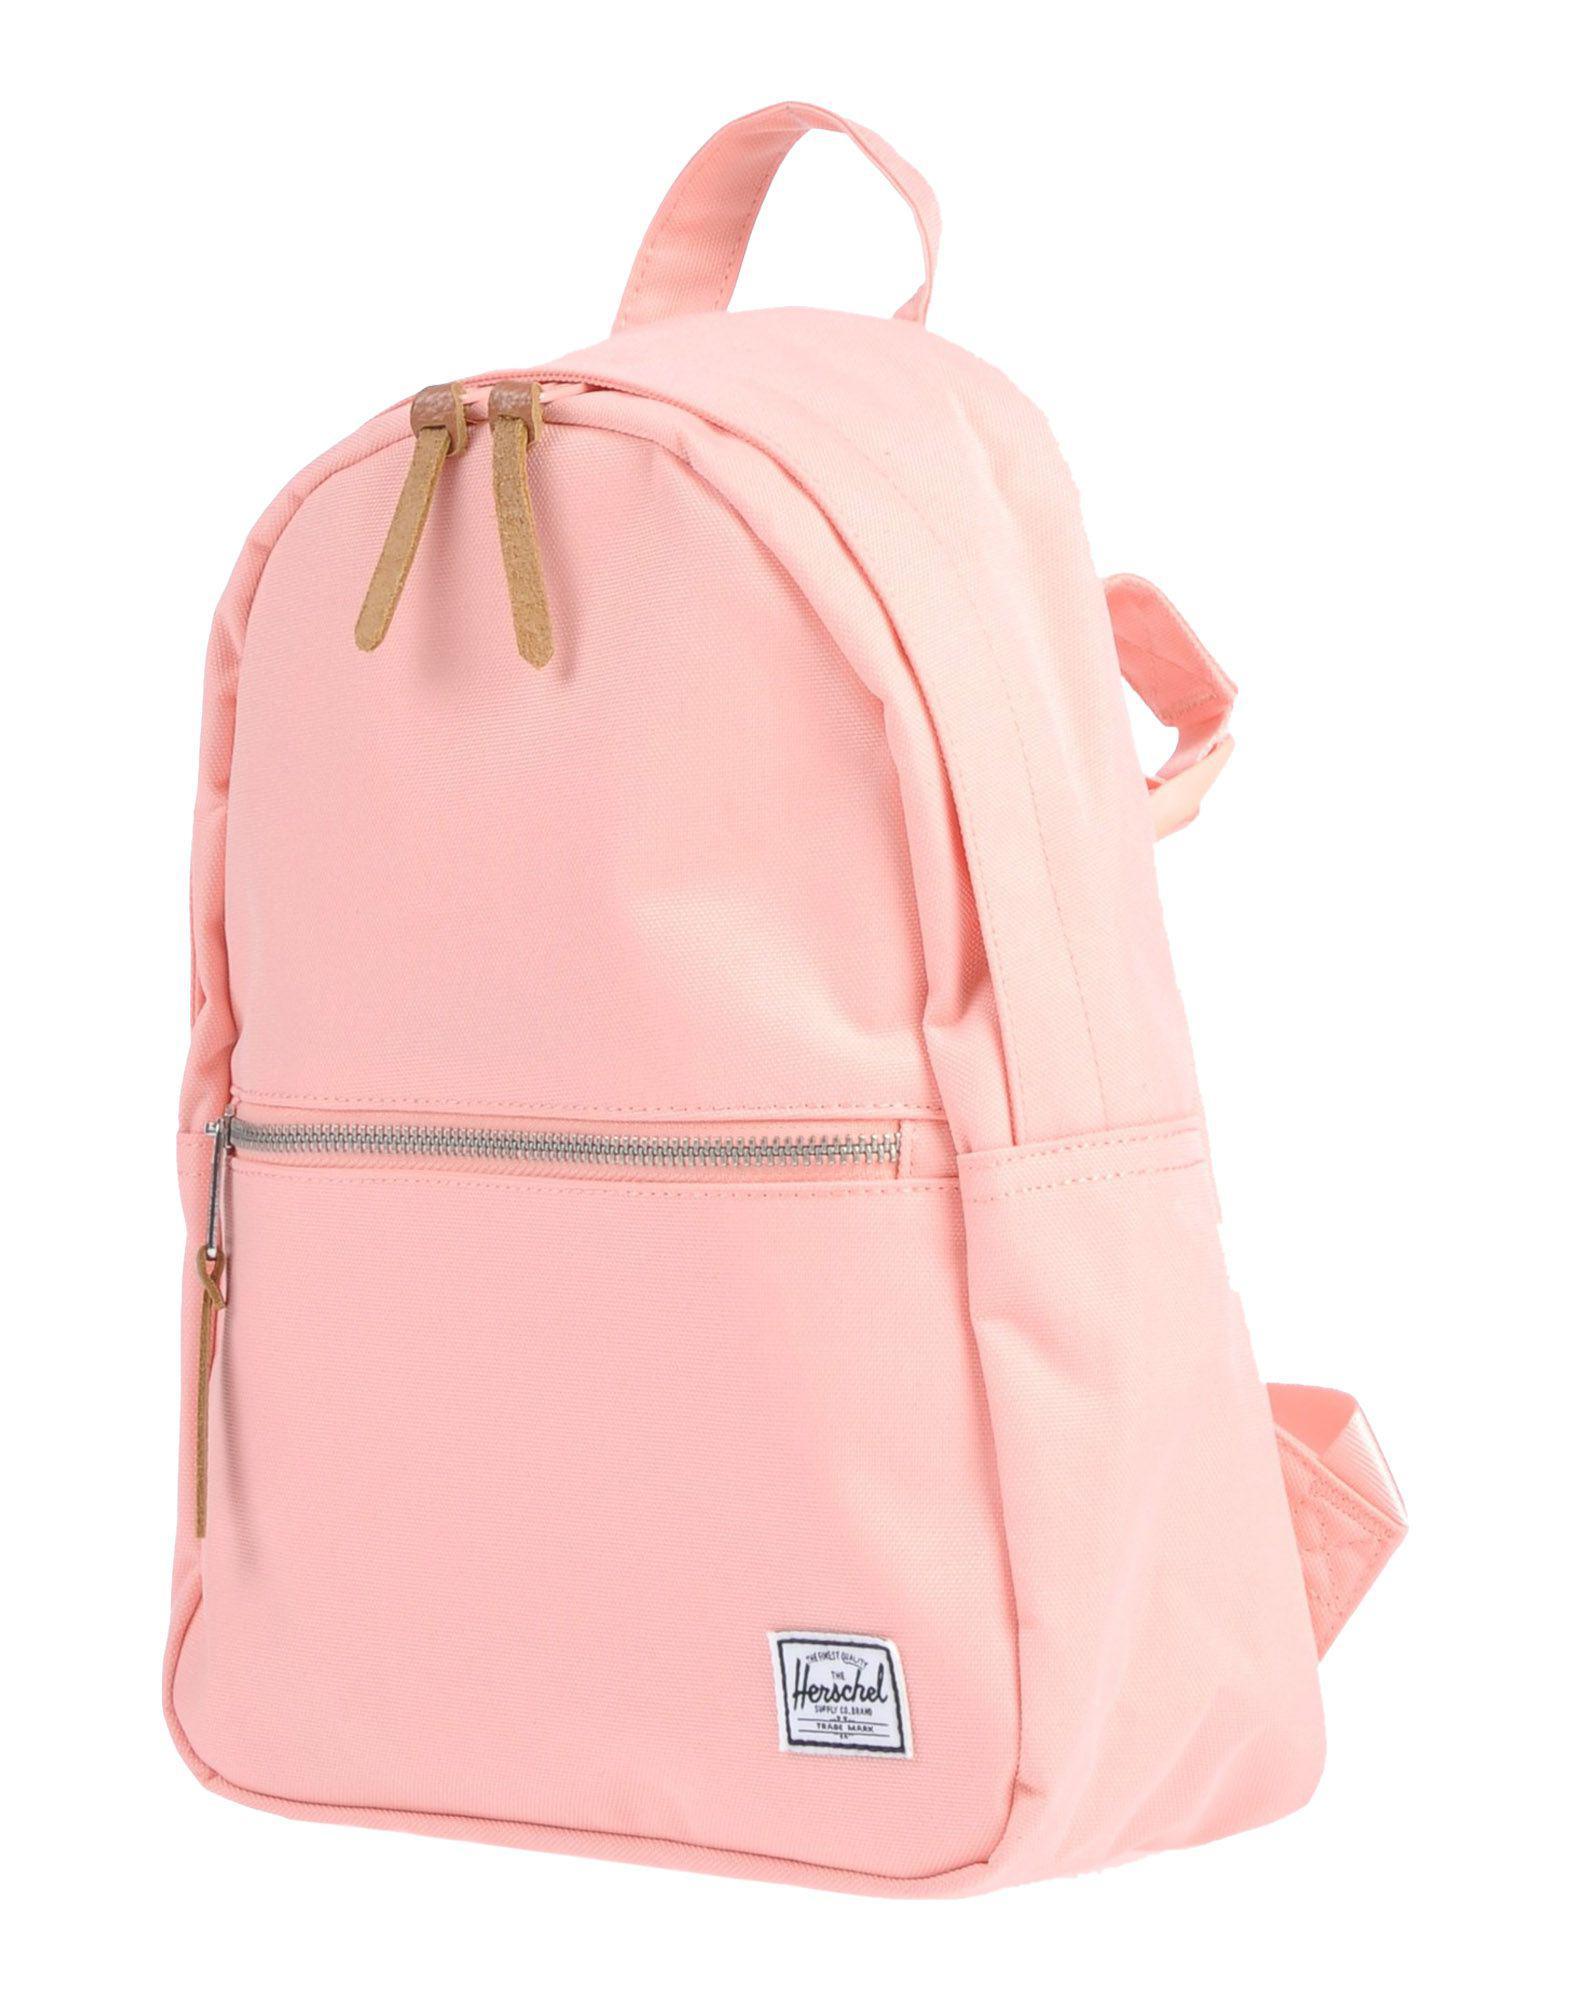 706de02e6fa Herschel Supply Co. Backpacks   Bum Bags in Pink - Lyst